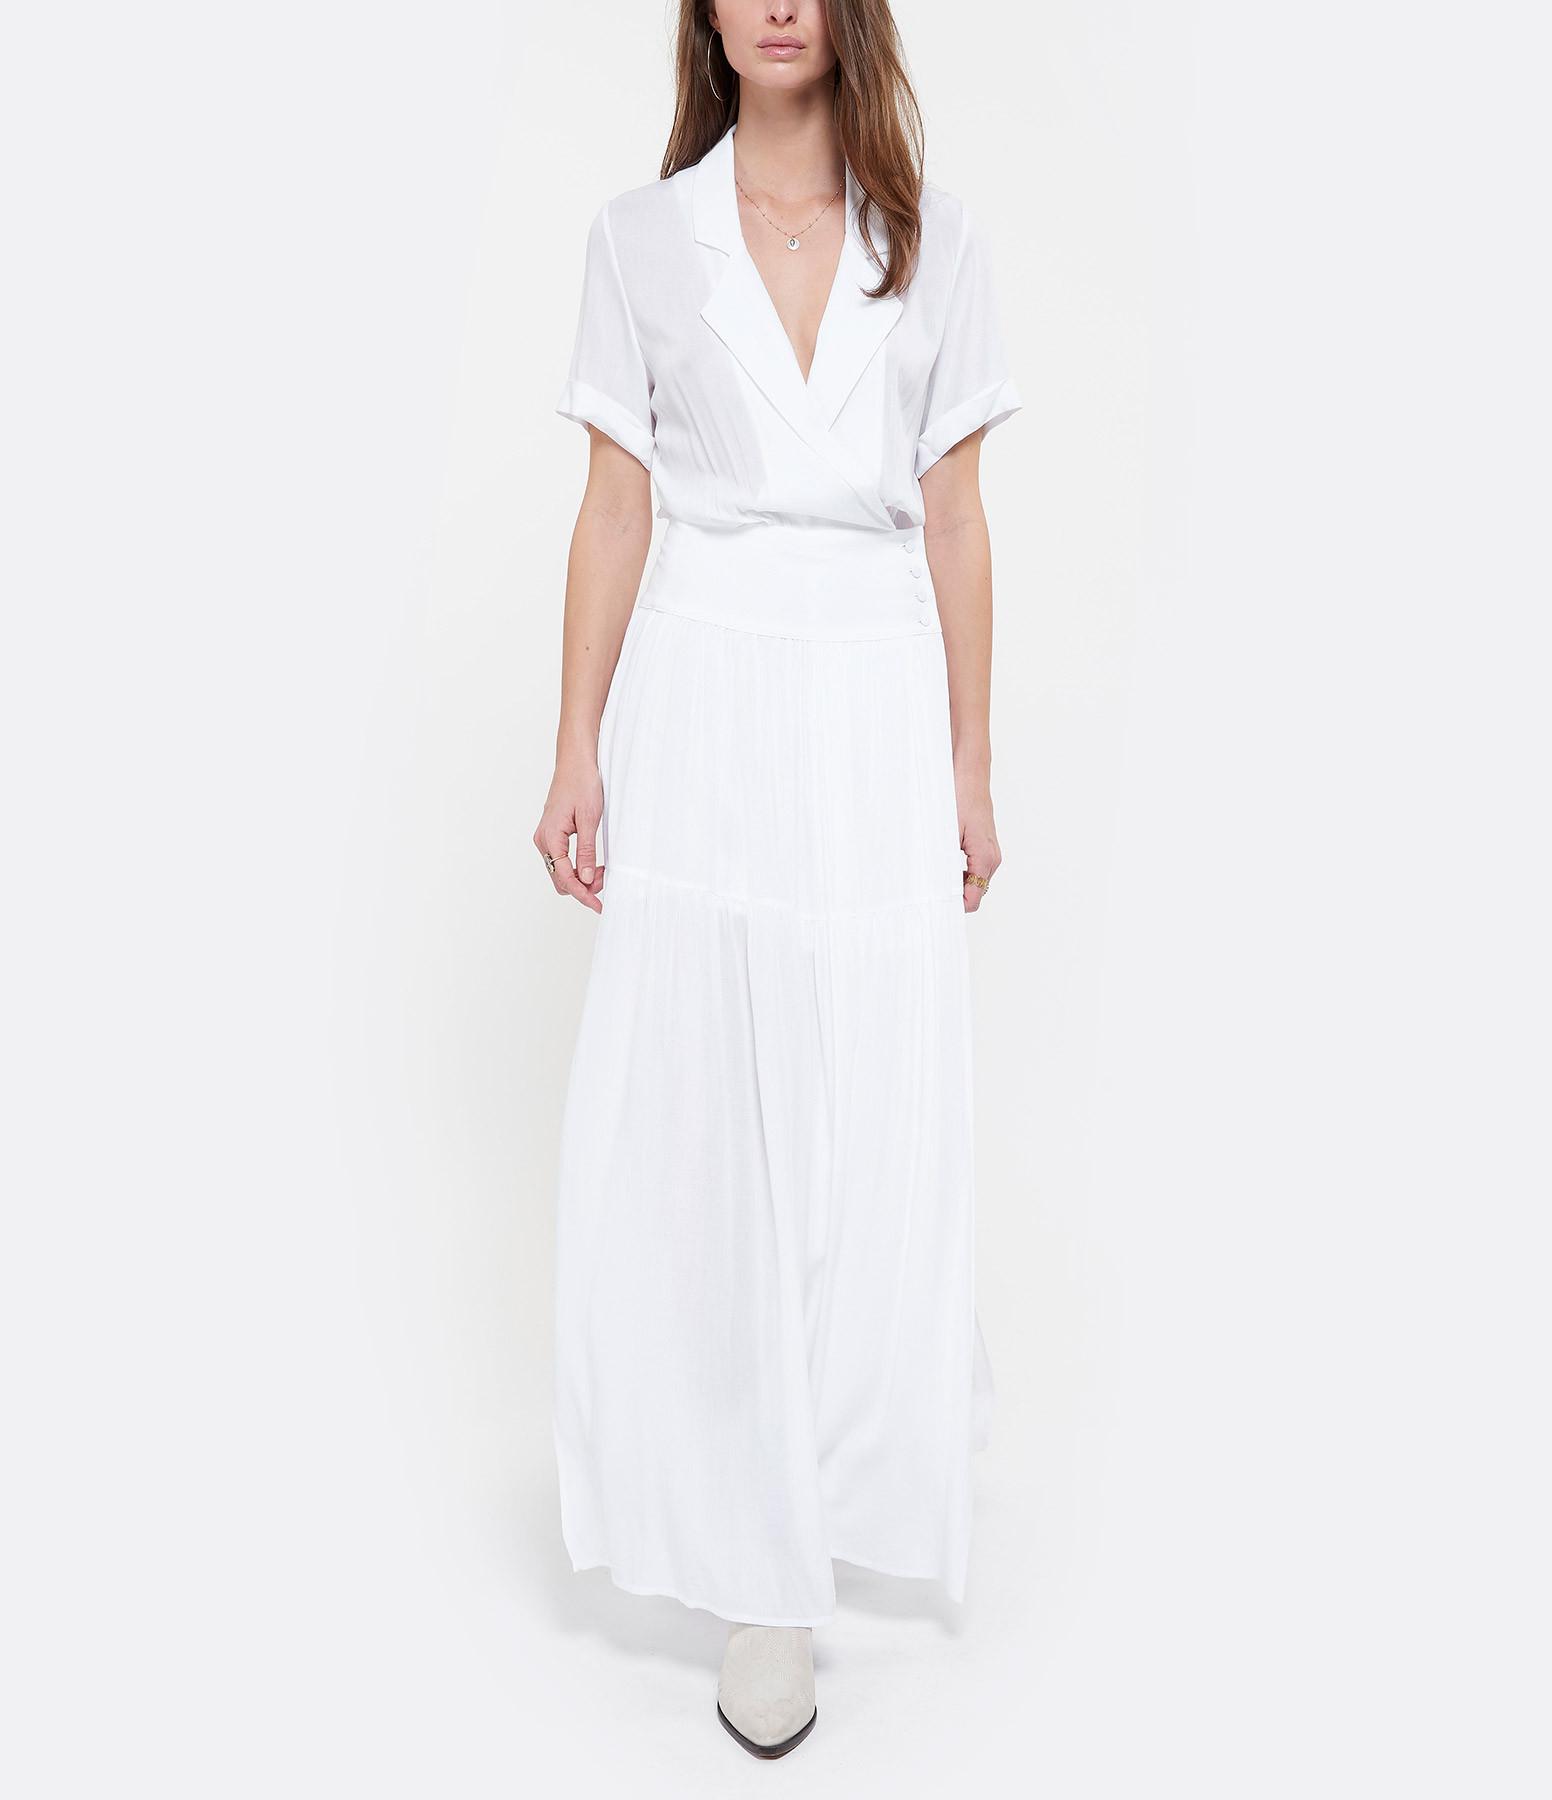 MARGAUX LONNBERG - Robe Gloria Blanc